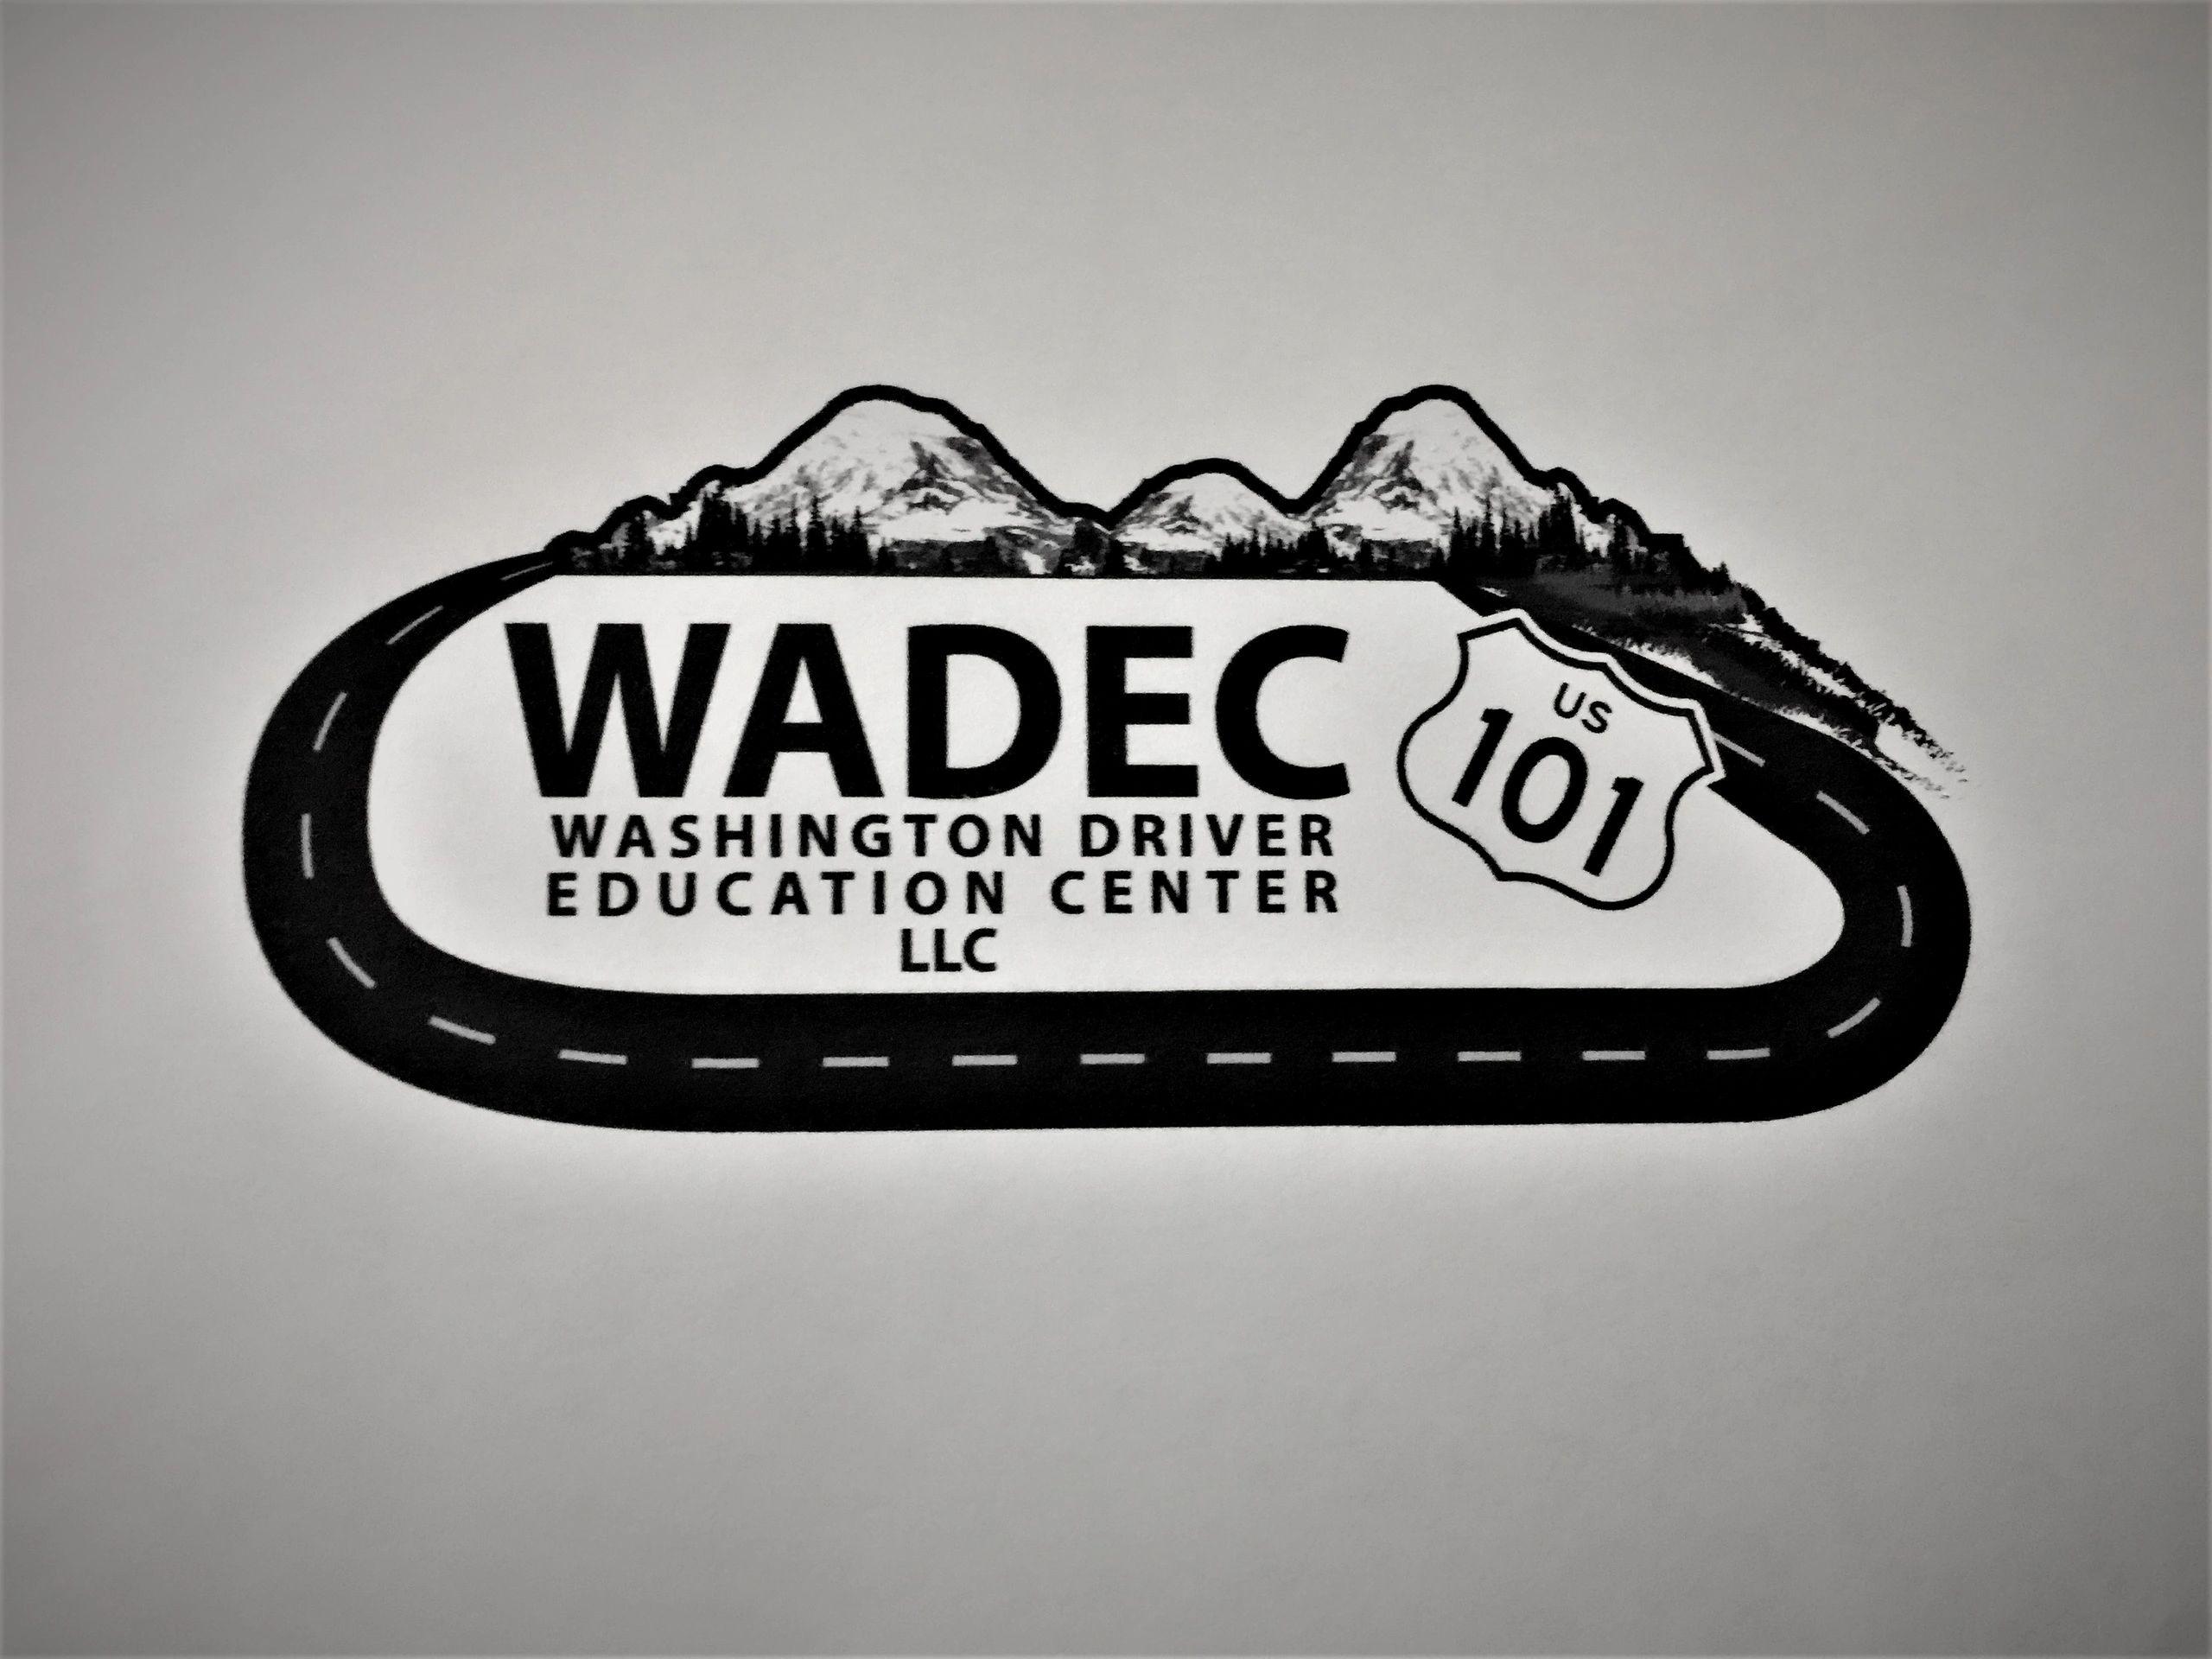 Drivers License Test - Washington Driver Education Center 101 LLC